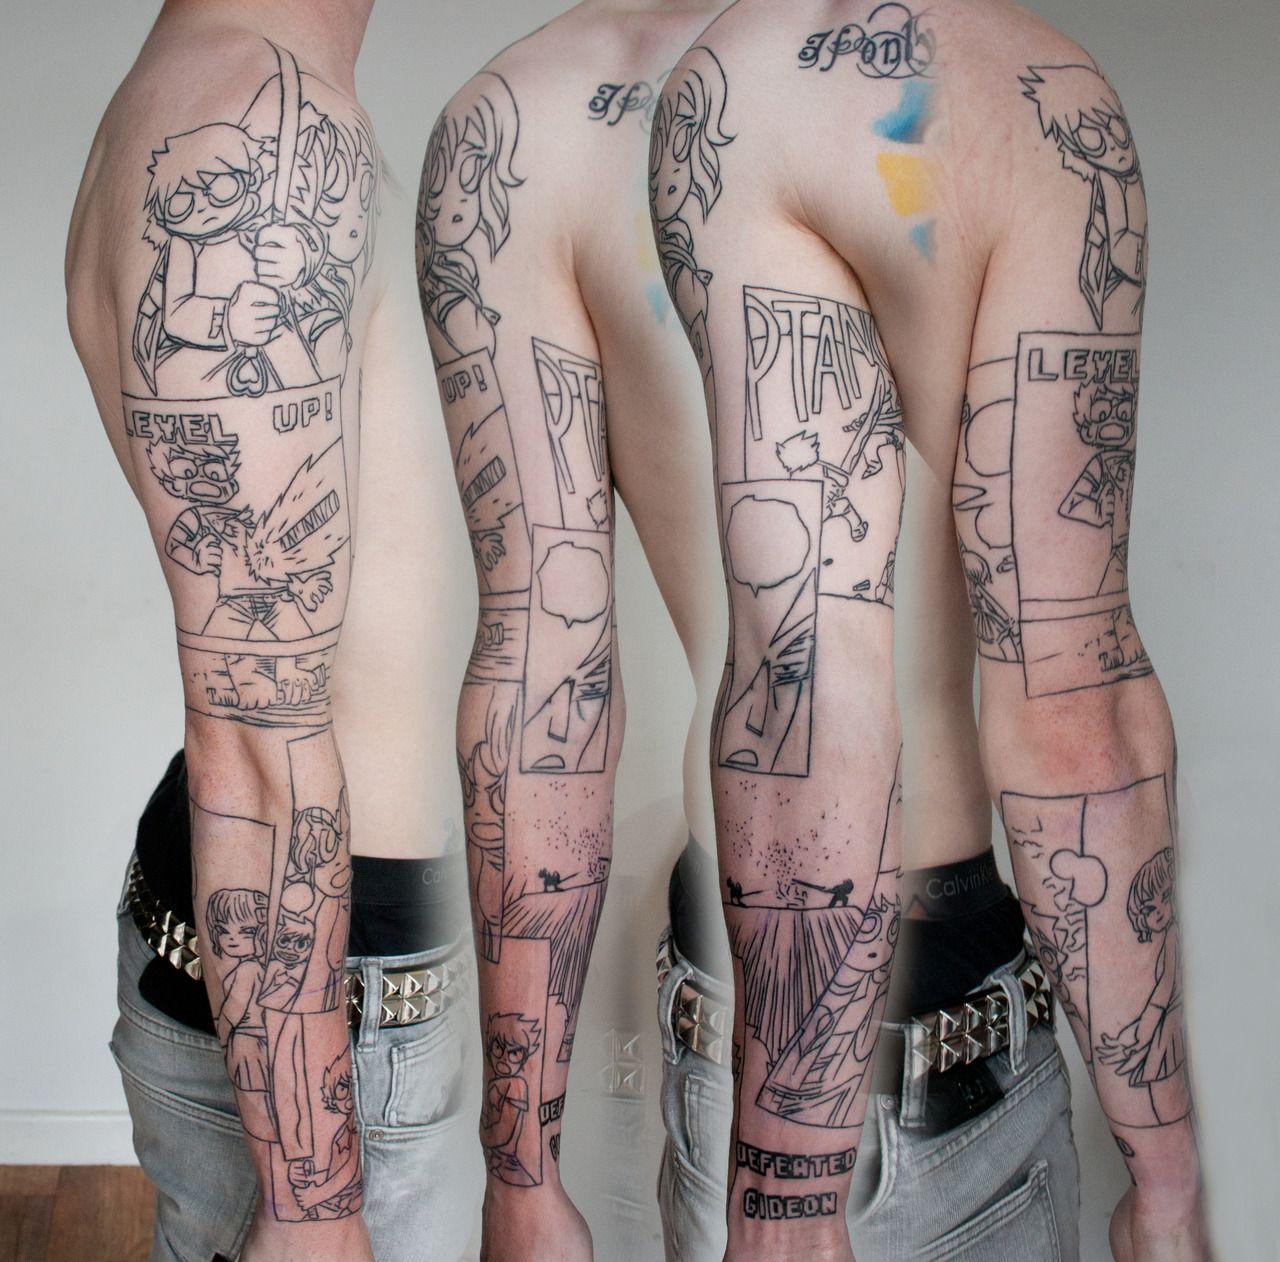 full sleeve tattoo designs tumblr Cool Tattoos Designs